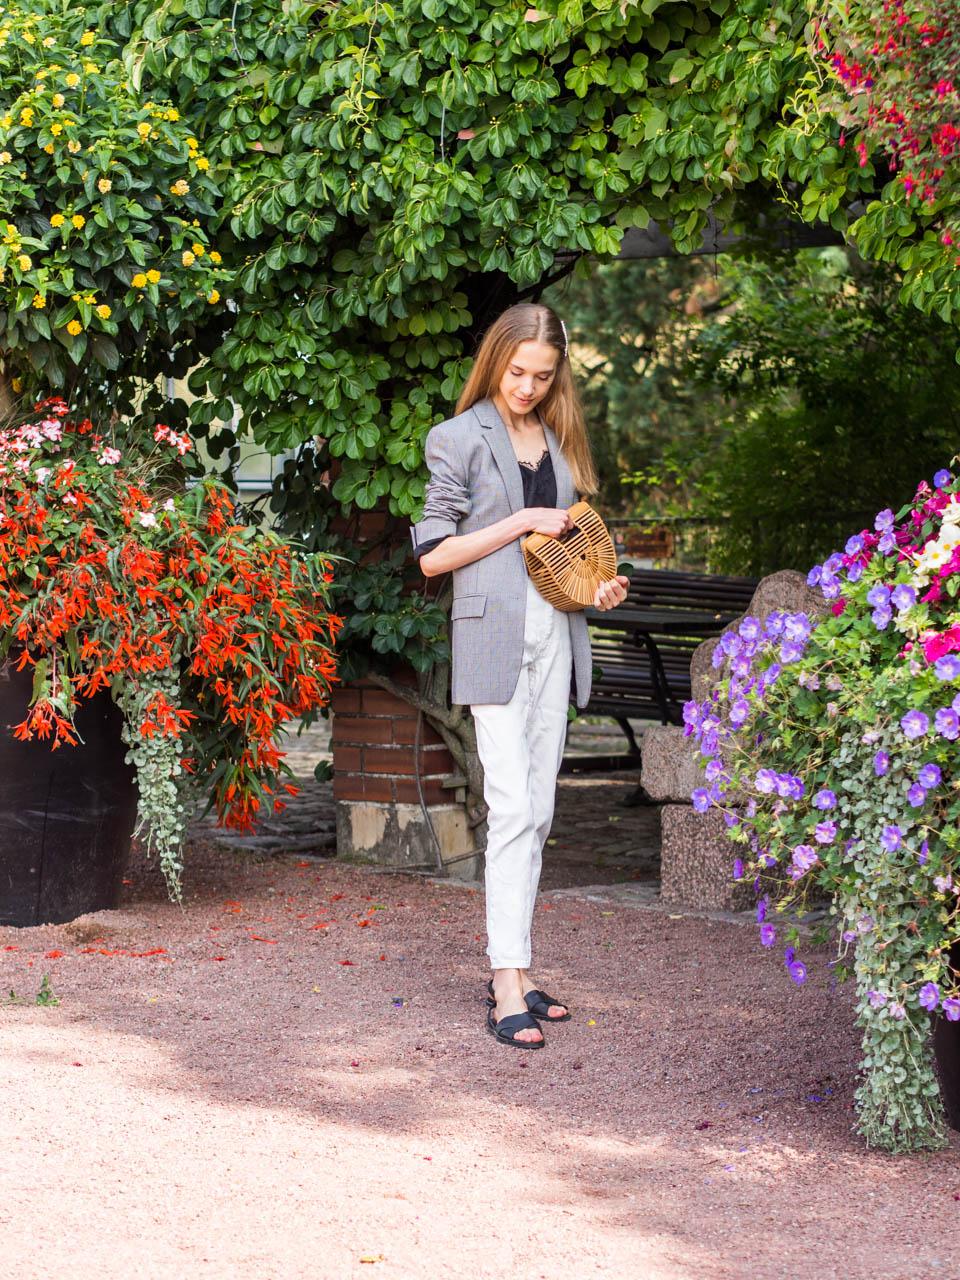 fashion-blogger-outfit-inspiration-chic-check-blazer-muoti-bloggaaja-inspiraatio-ruutubleiseri